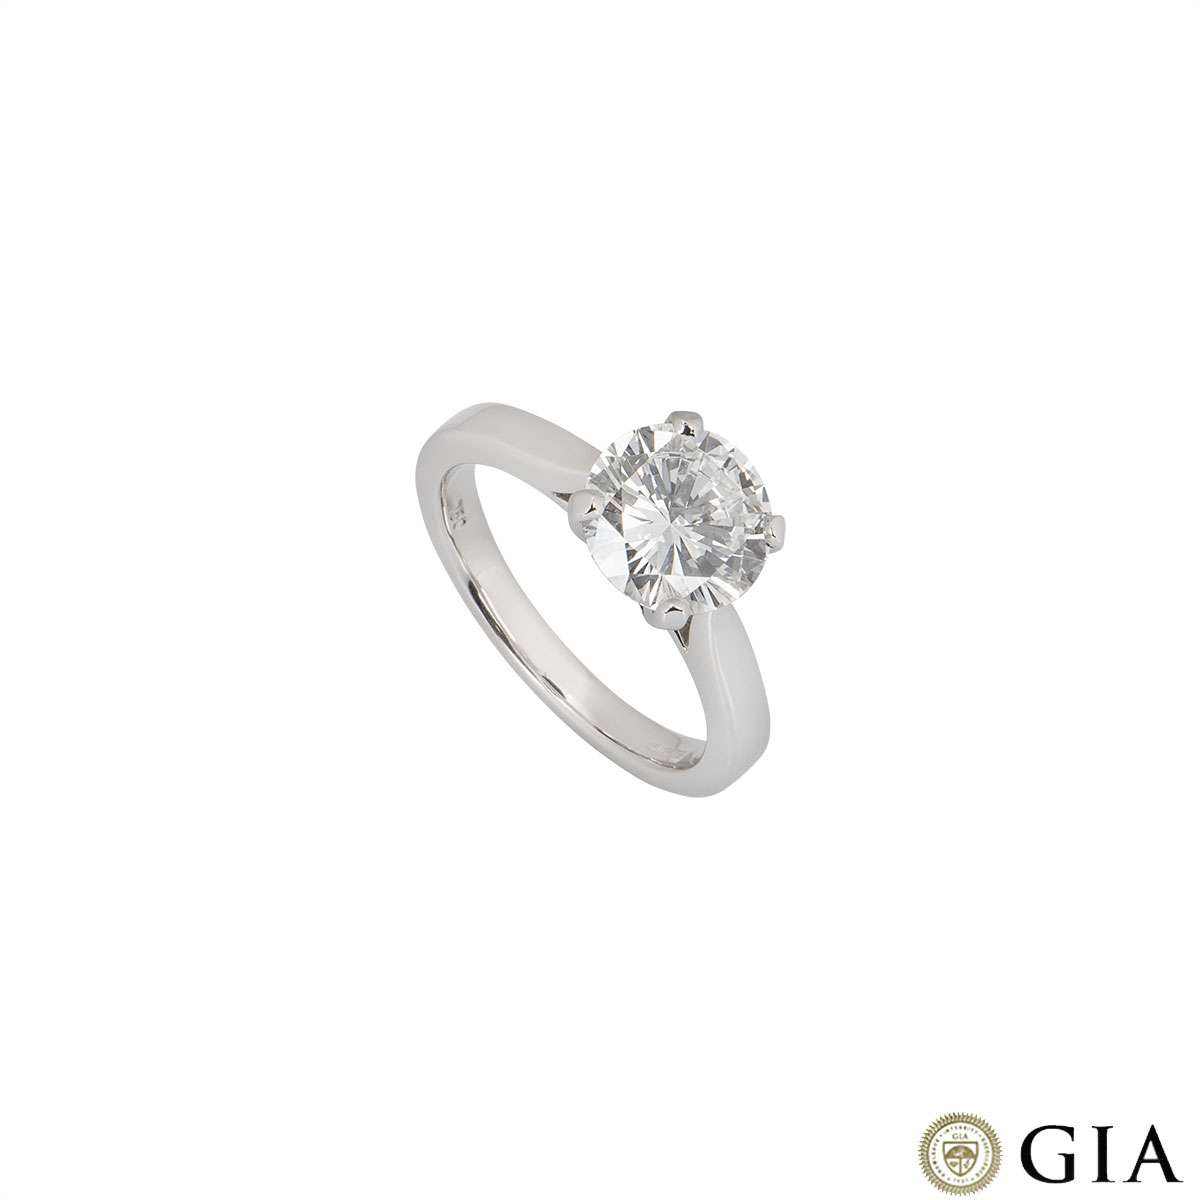 White Gold Round Brilliant Cut Diamond Ring 2.08ct E/VVS2